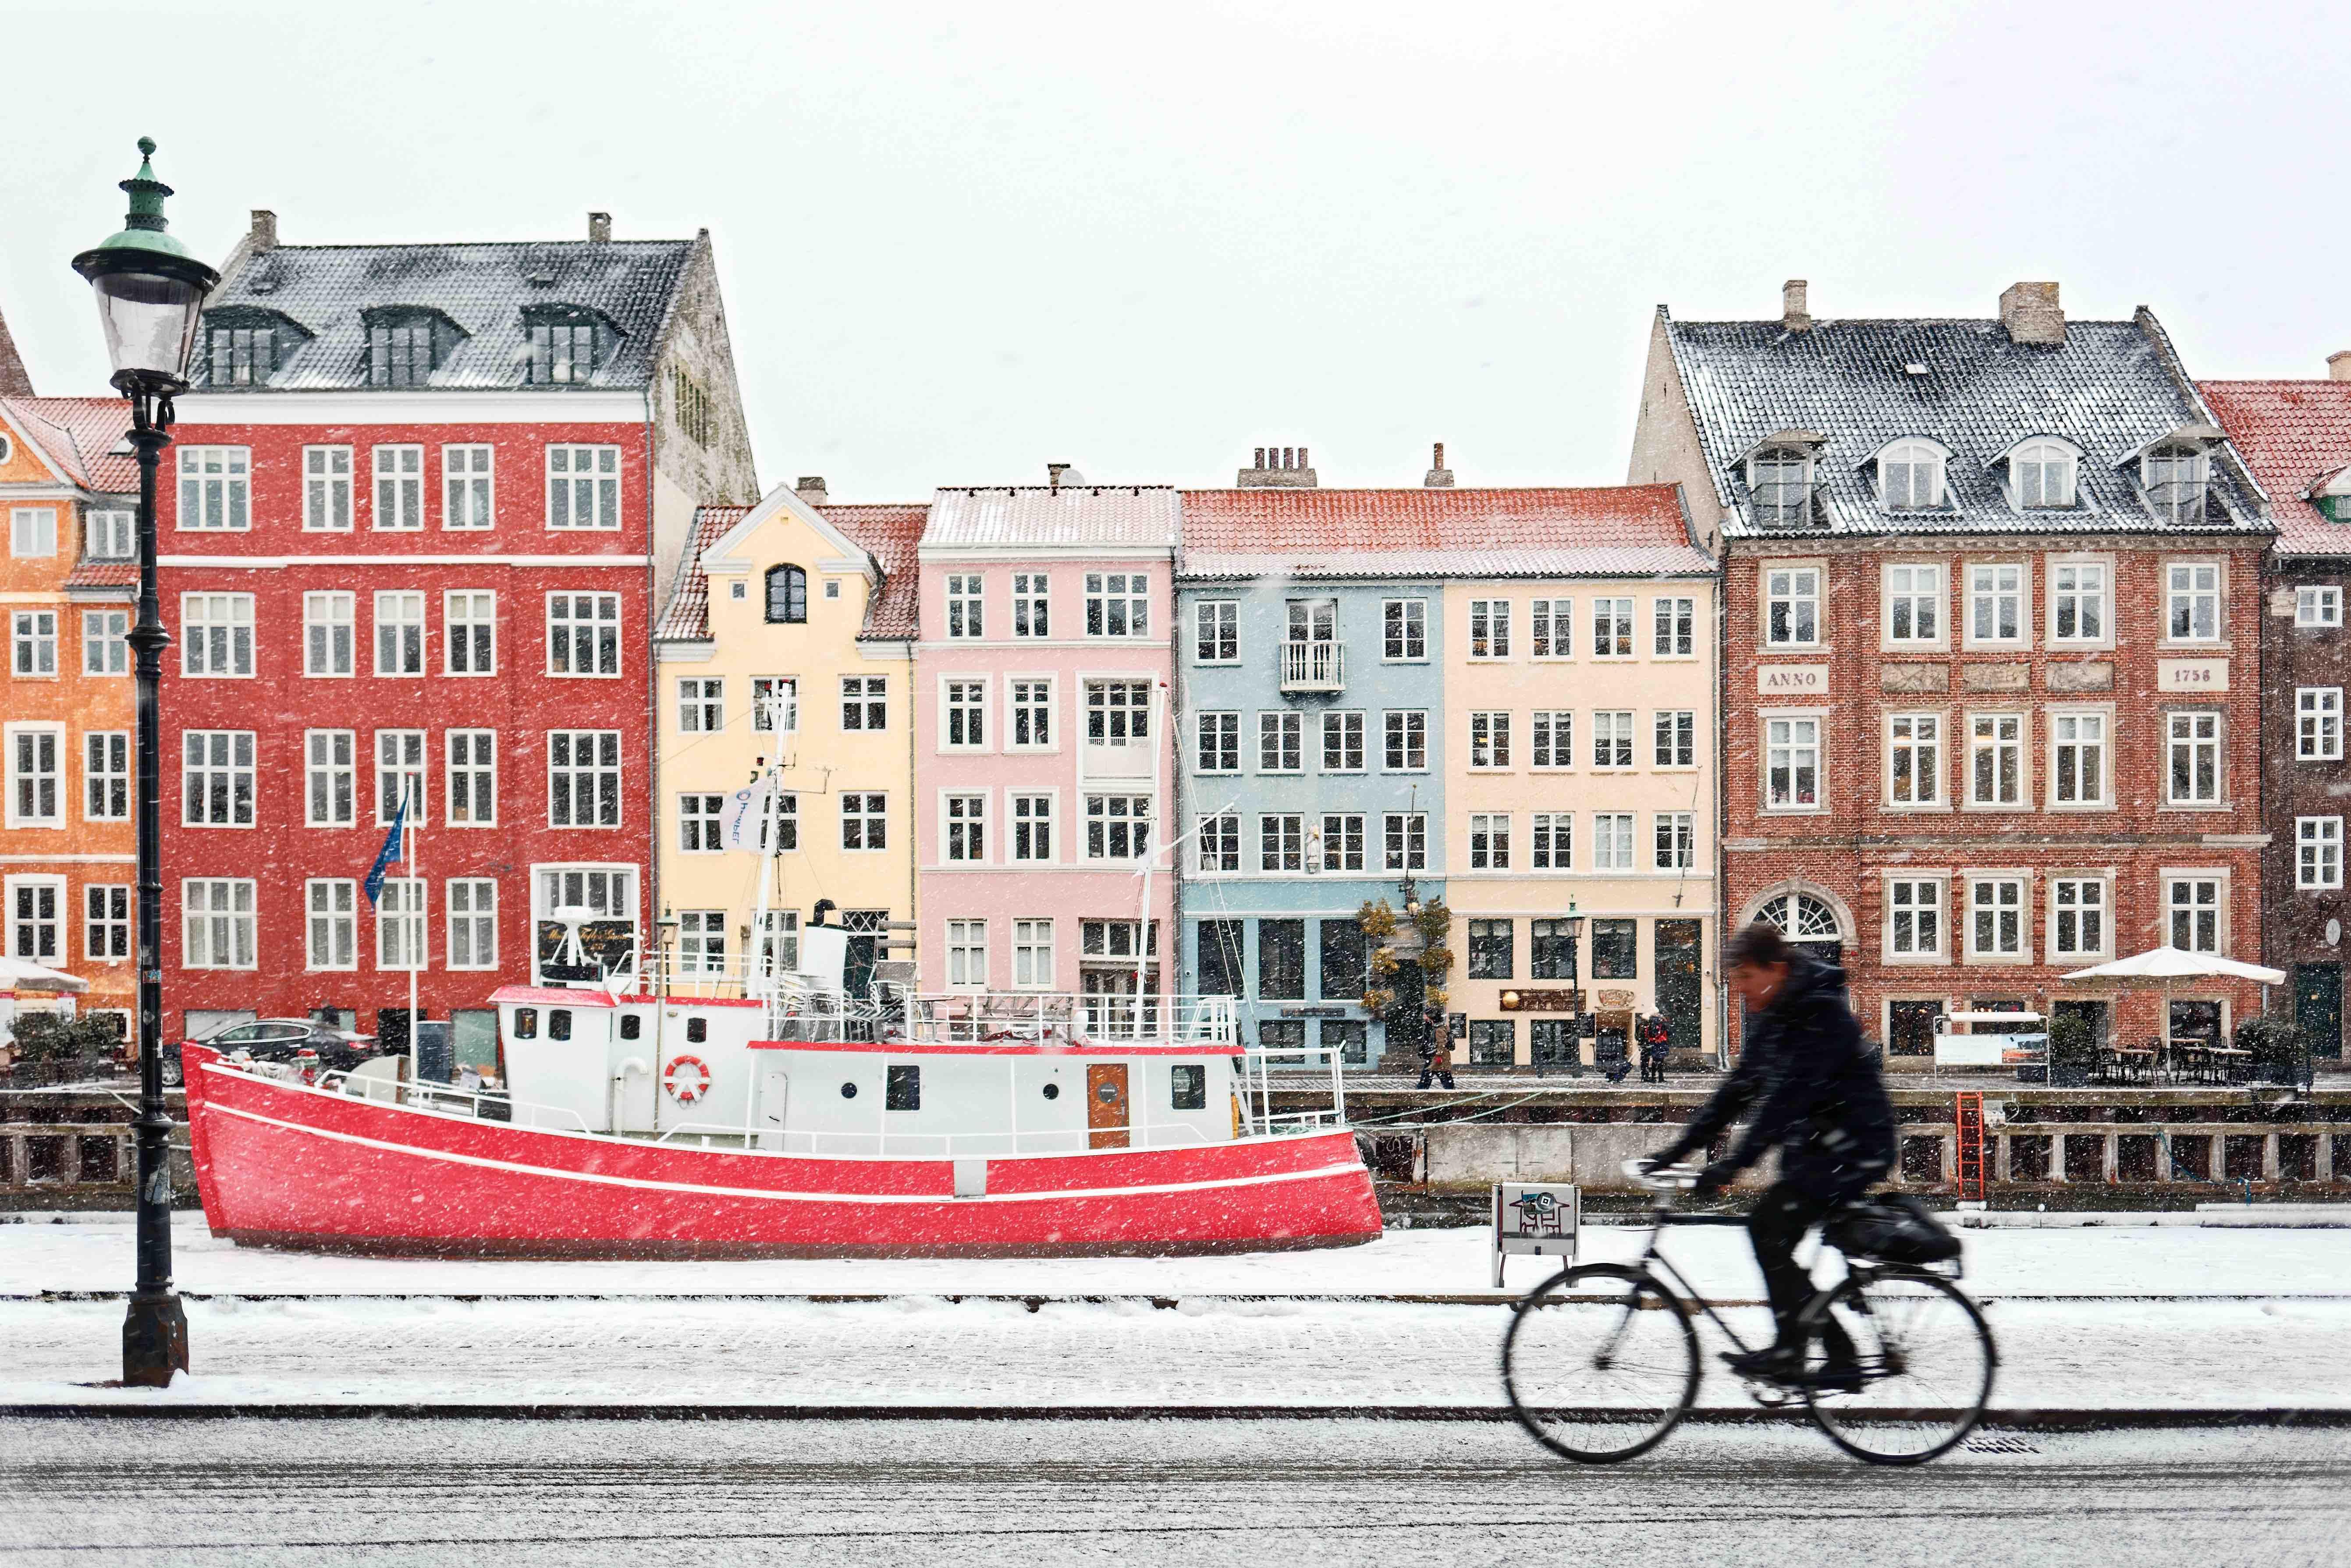 Moverse por Copenhague en transporte público